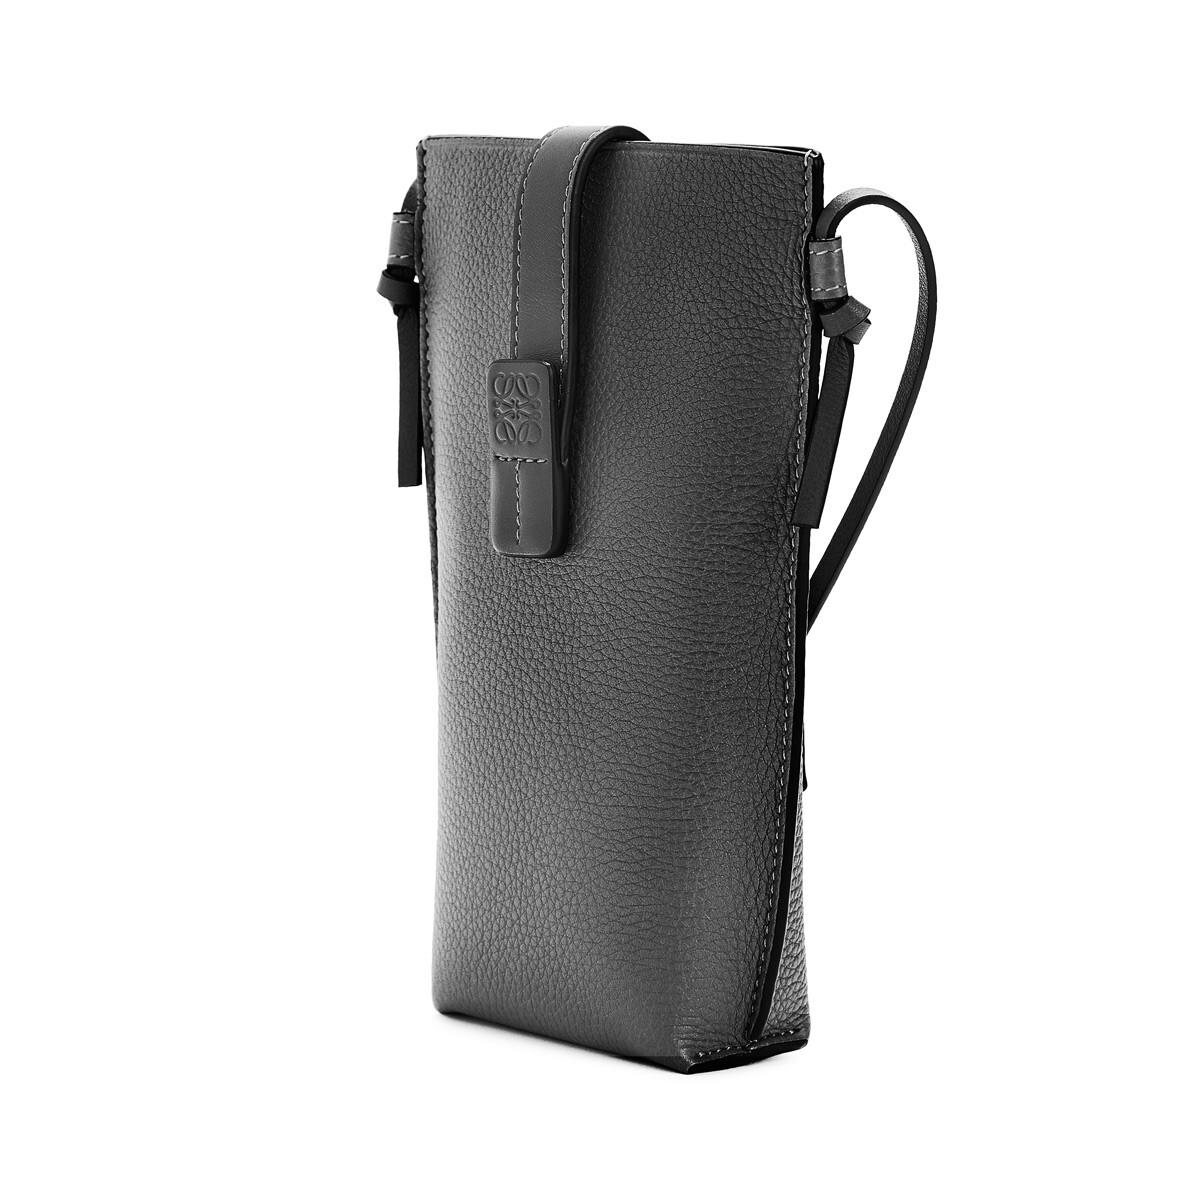 LOEWE Pocket Black front